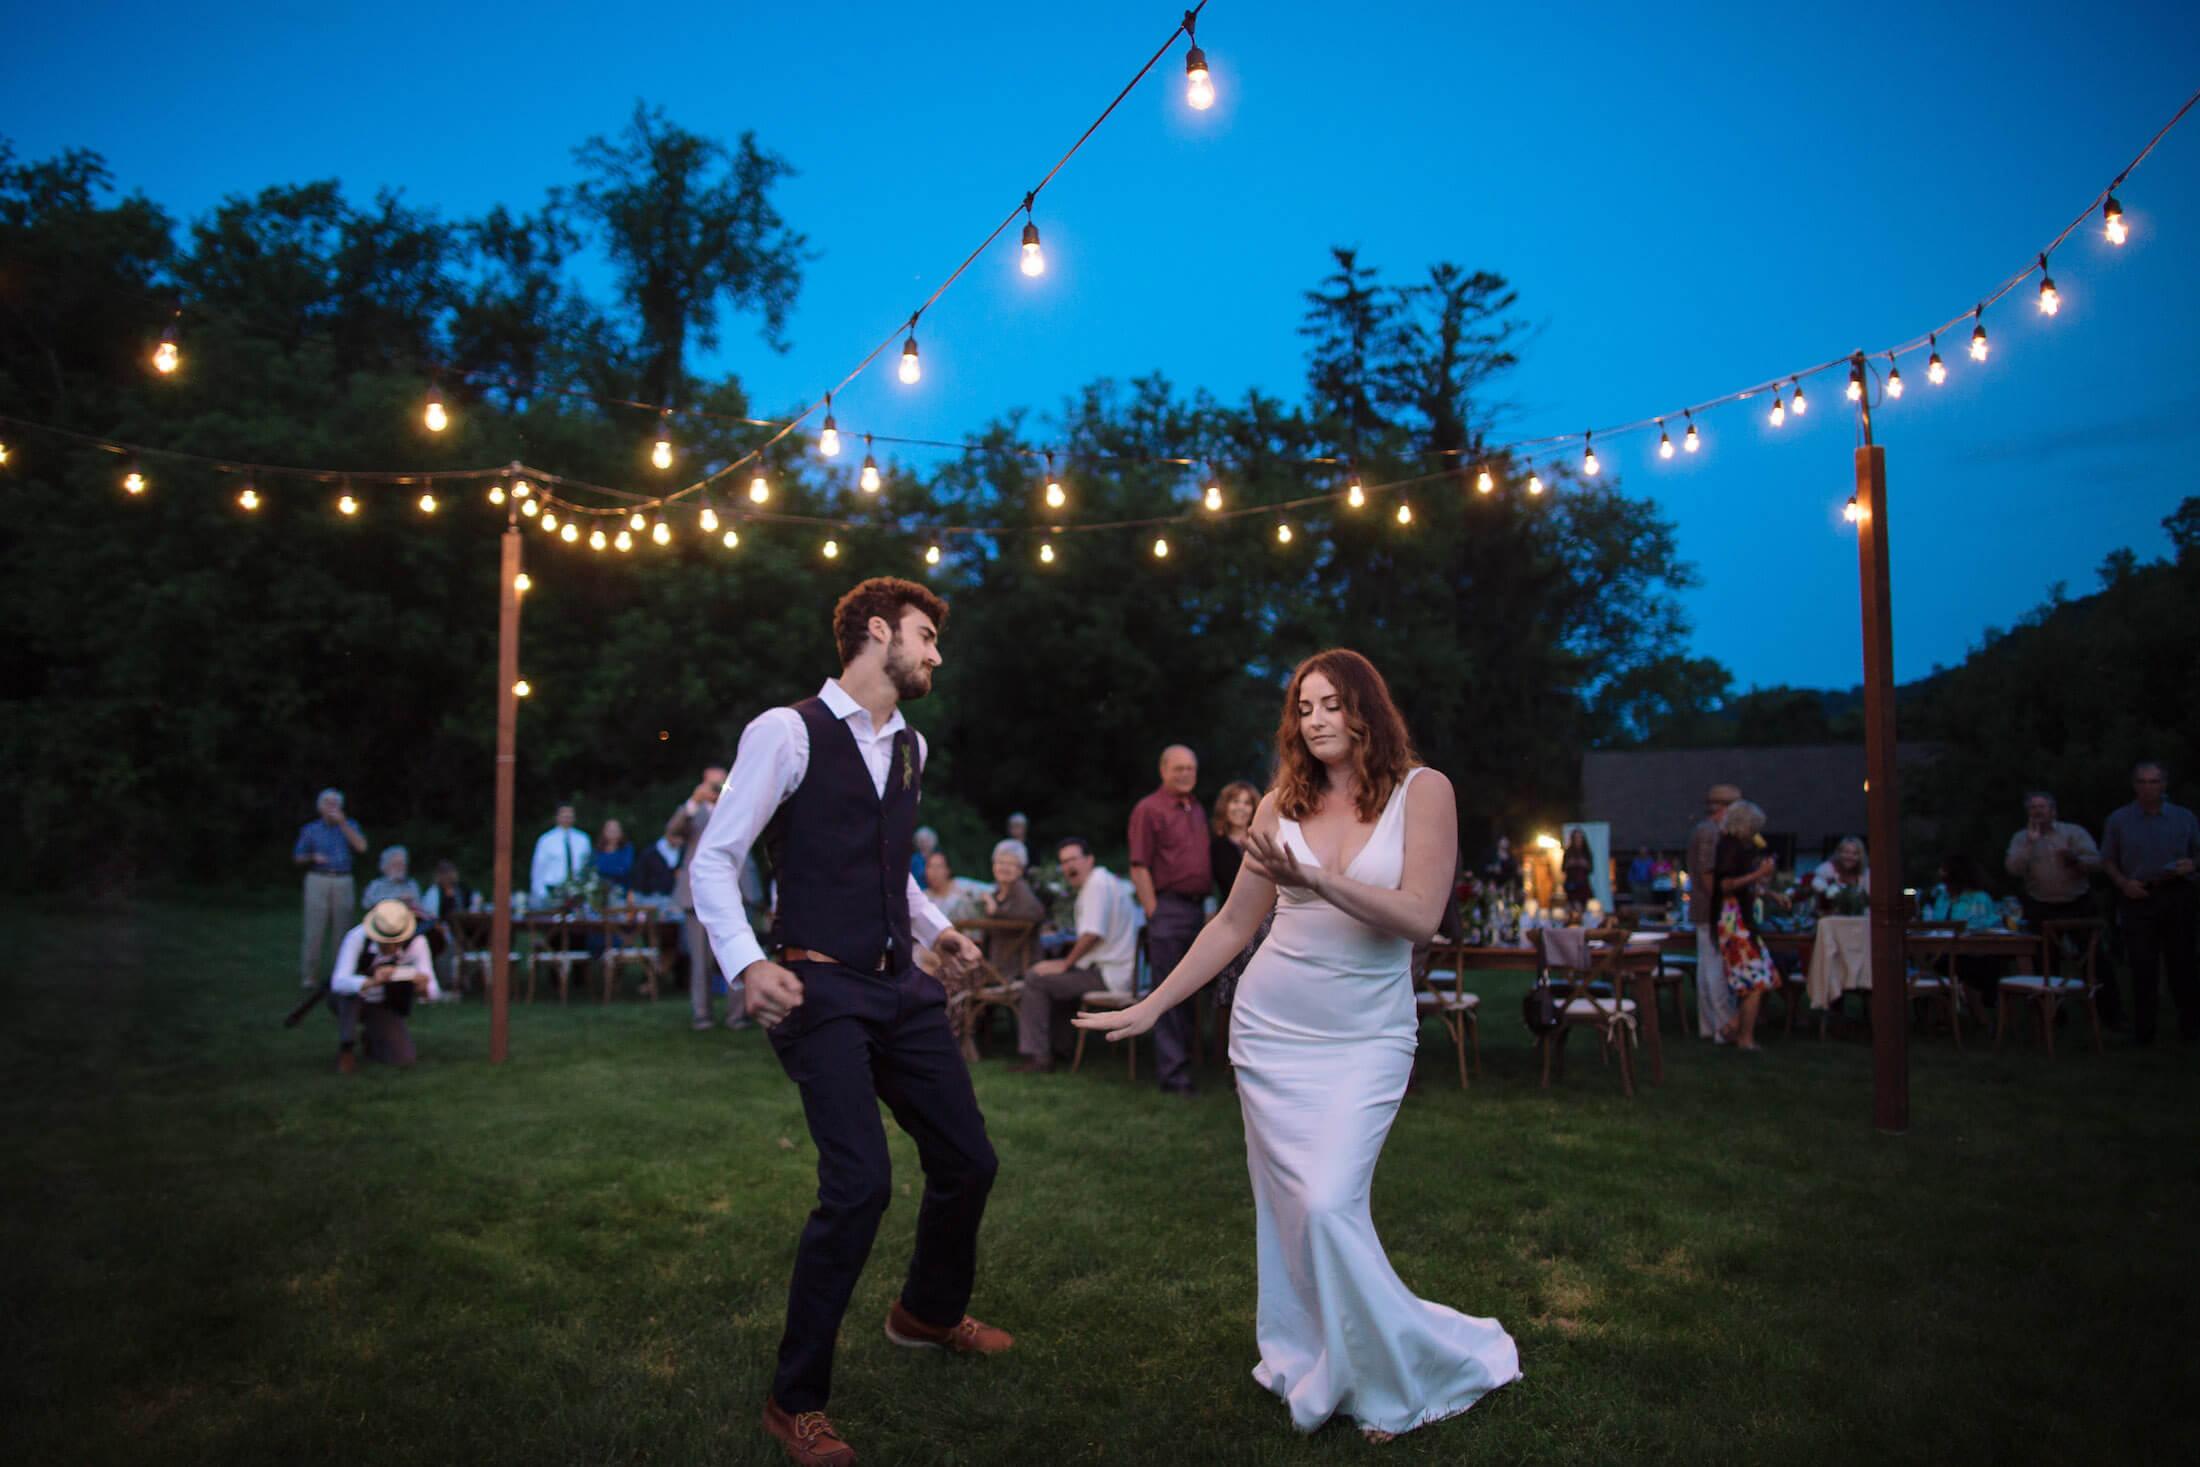 engle-olson-ray-kelly-photography-wisconsin-wedding-137.jpg